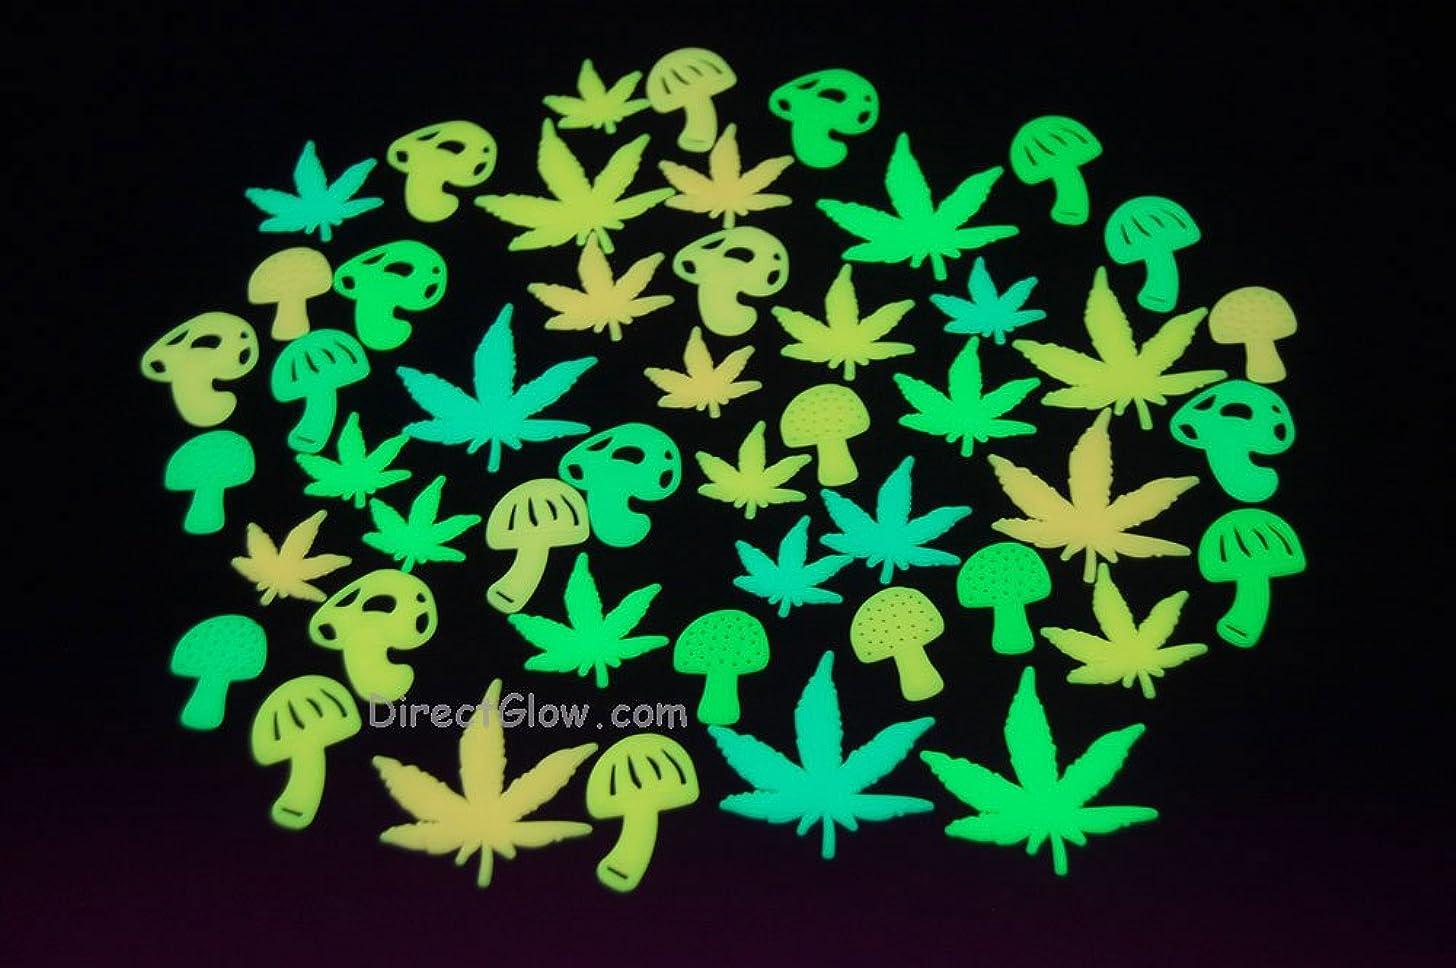 48 Piece Glow in the Dark Marijuana Weed Pot Leafs and Mushrooms